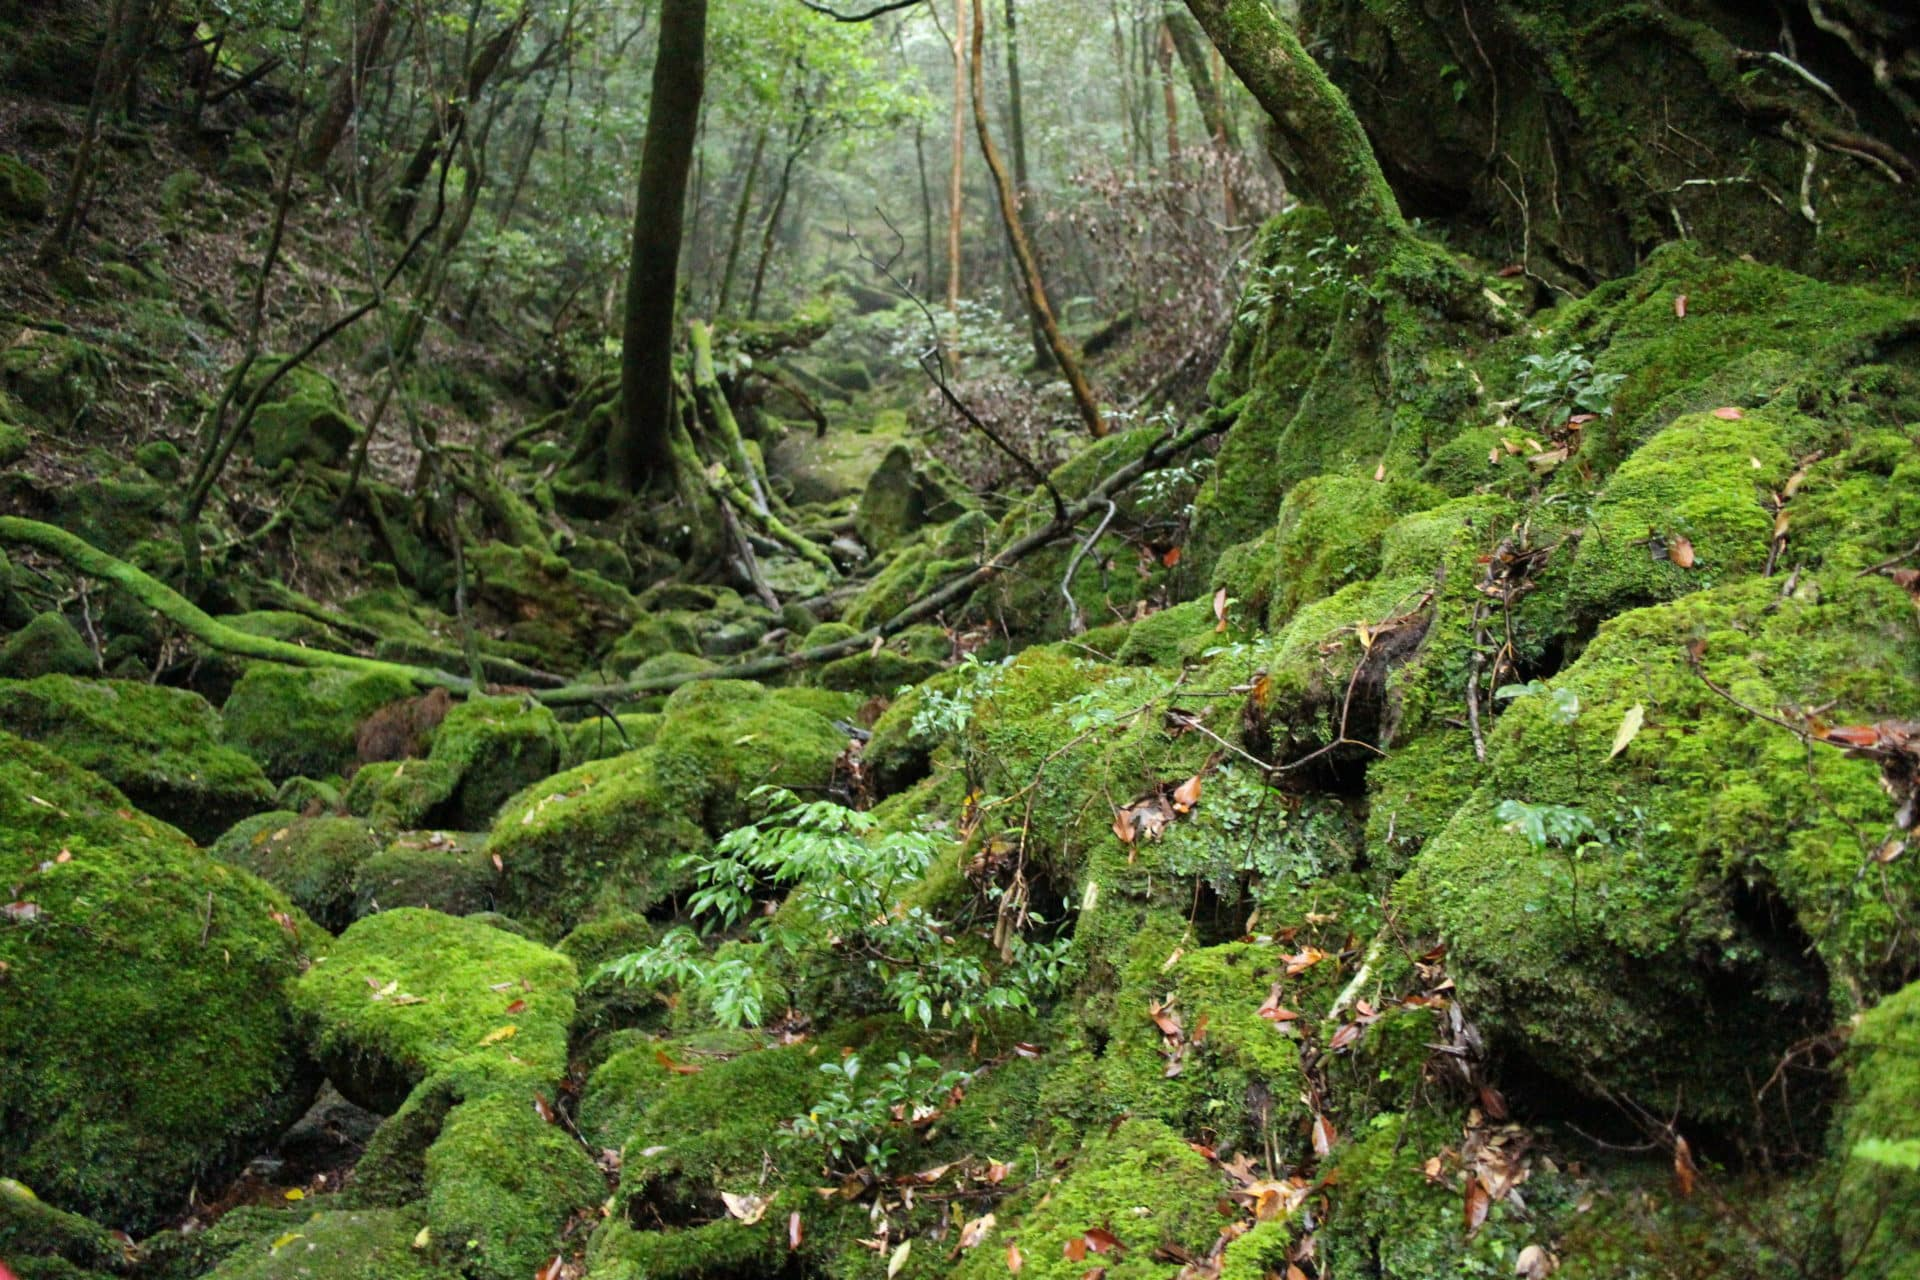 1 Day Shiratani-Unsuikyo Trekking Tour, Yakushima (private)